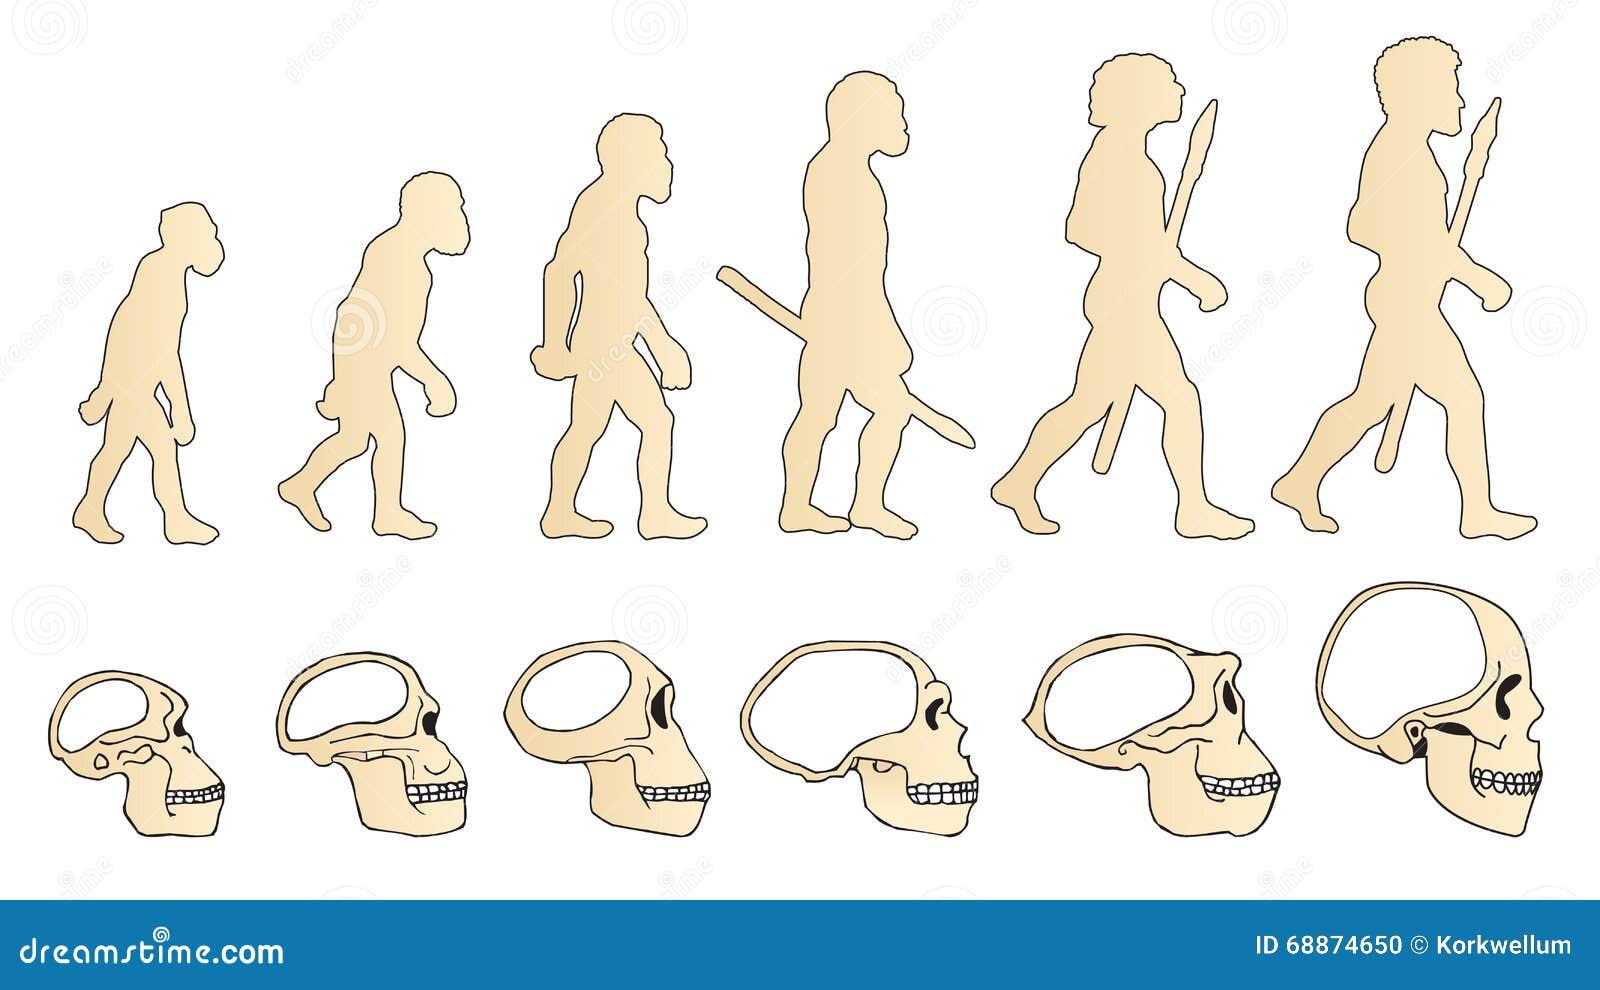 Ewolucja czaszka ludzka czaszka austria Homo Erectus Neanderthalensis Homo sapiens